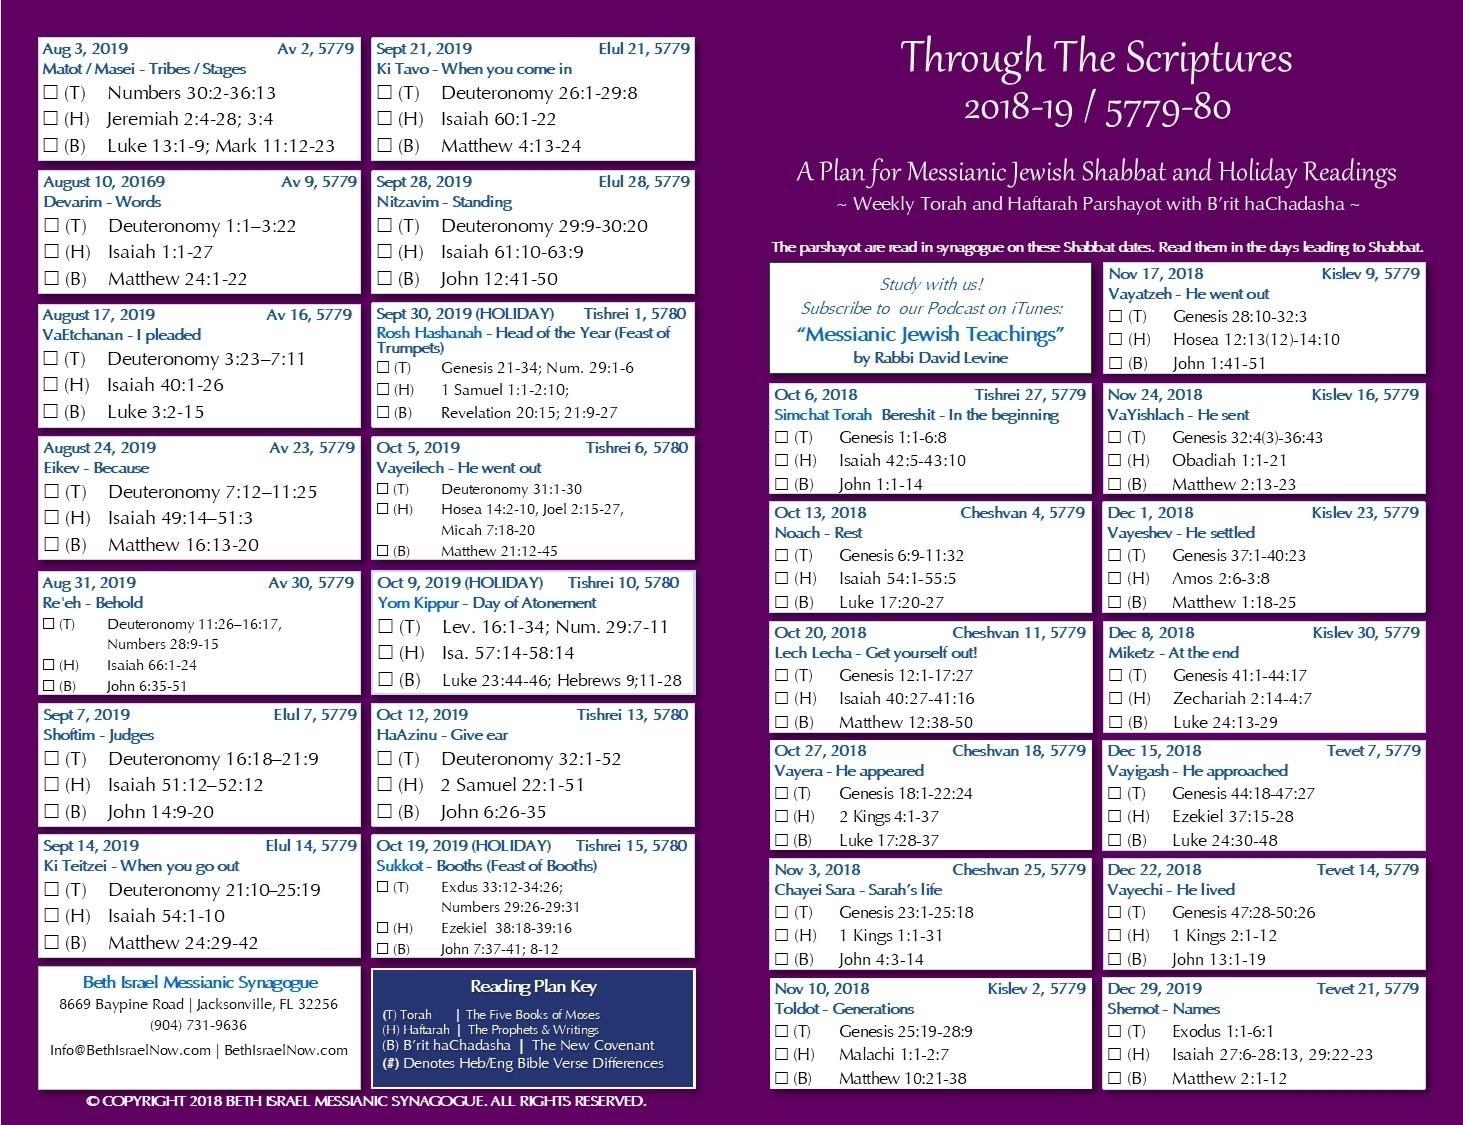 Weekly Torah Parsha Calendar For 2019/2020 - Calendar intended for Printable Torah Portion Reading Schedule